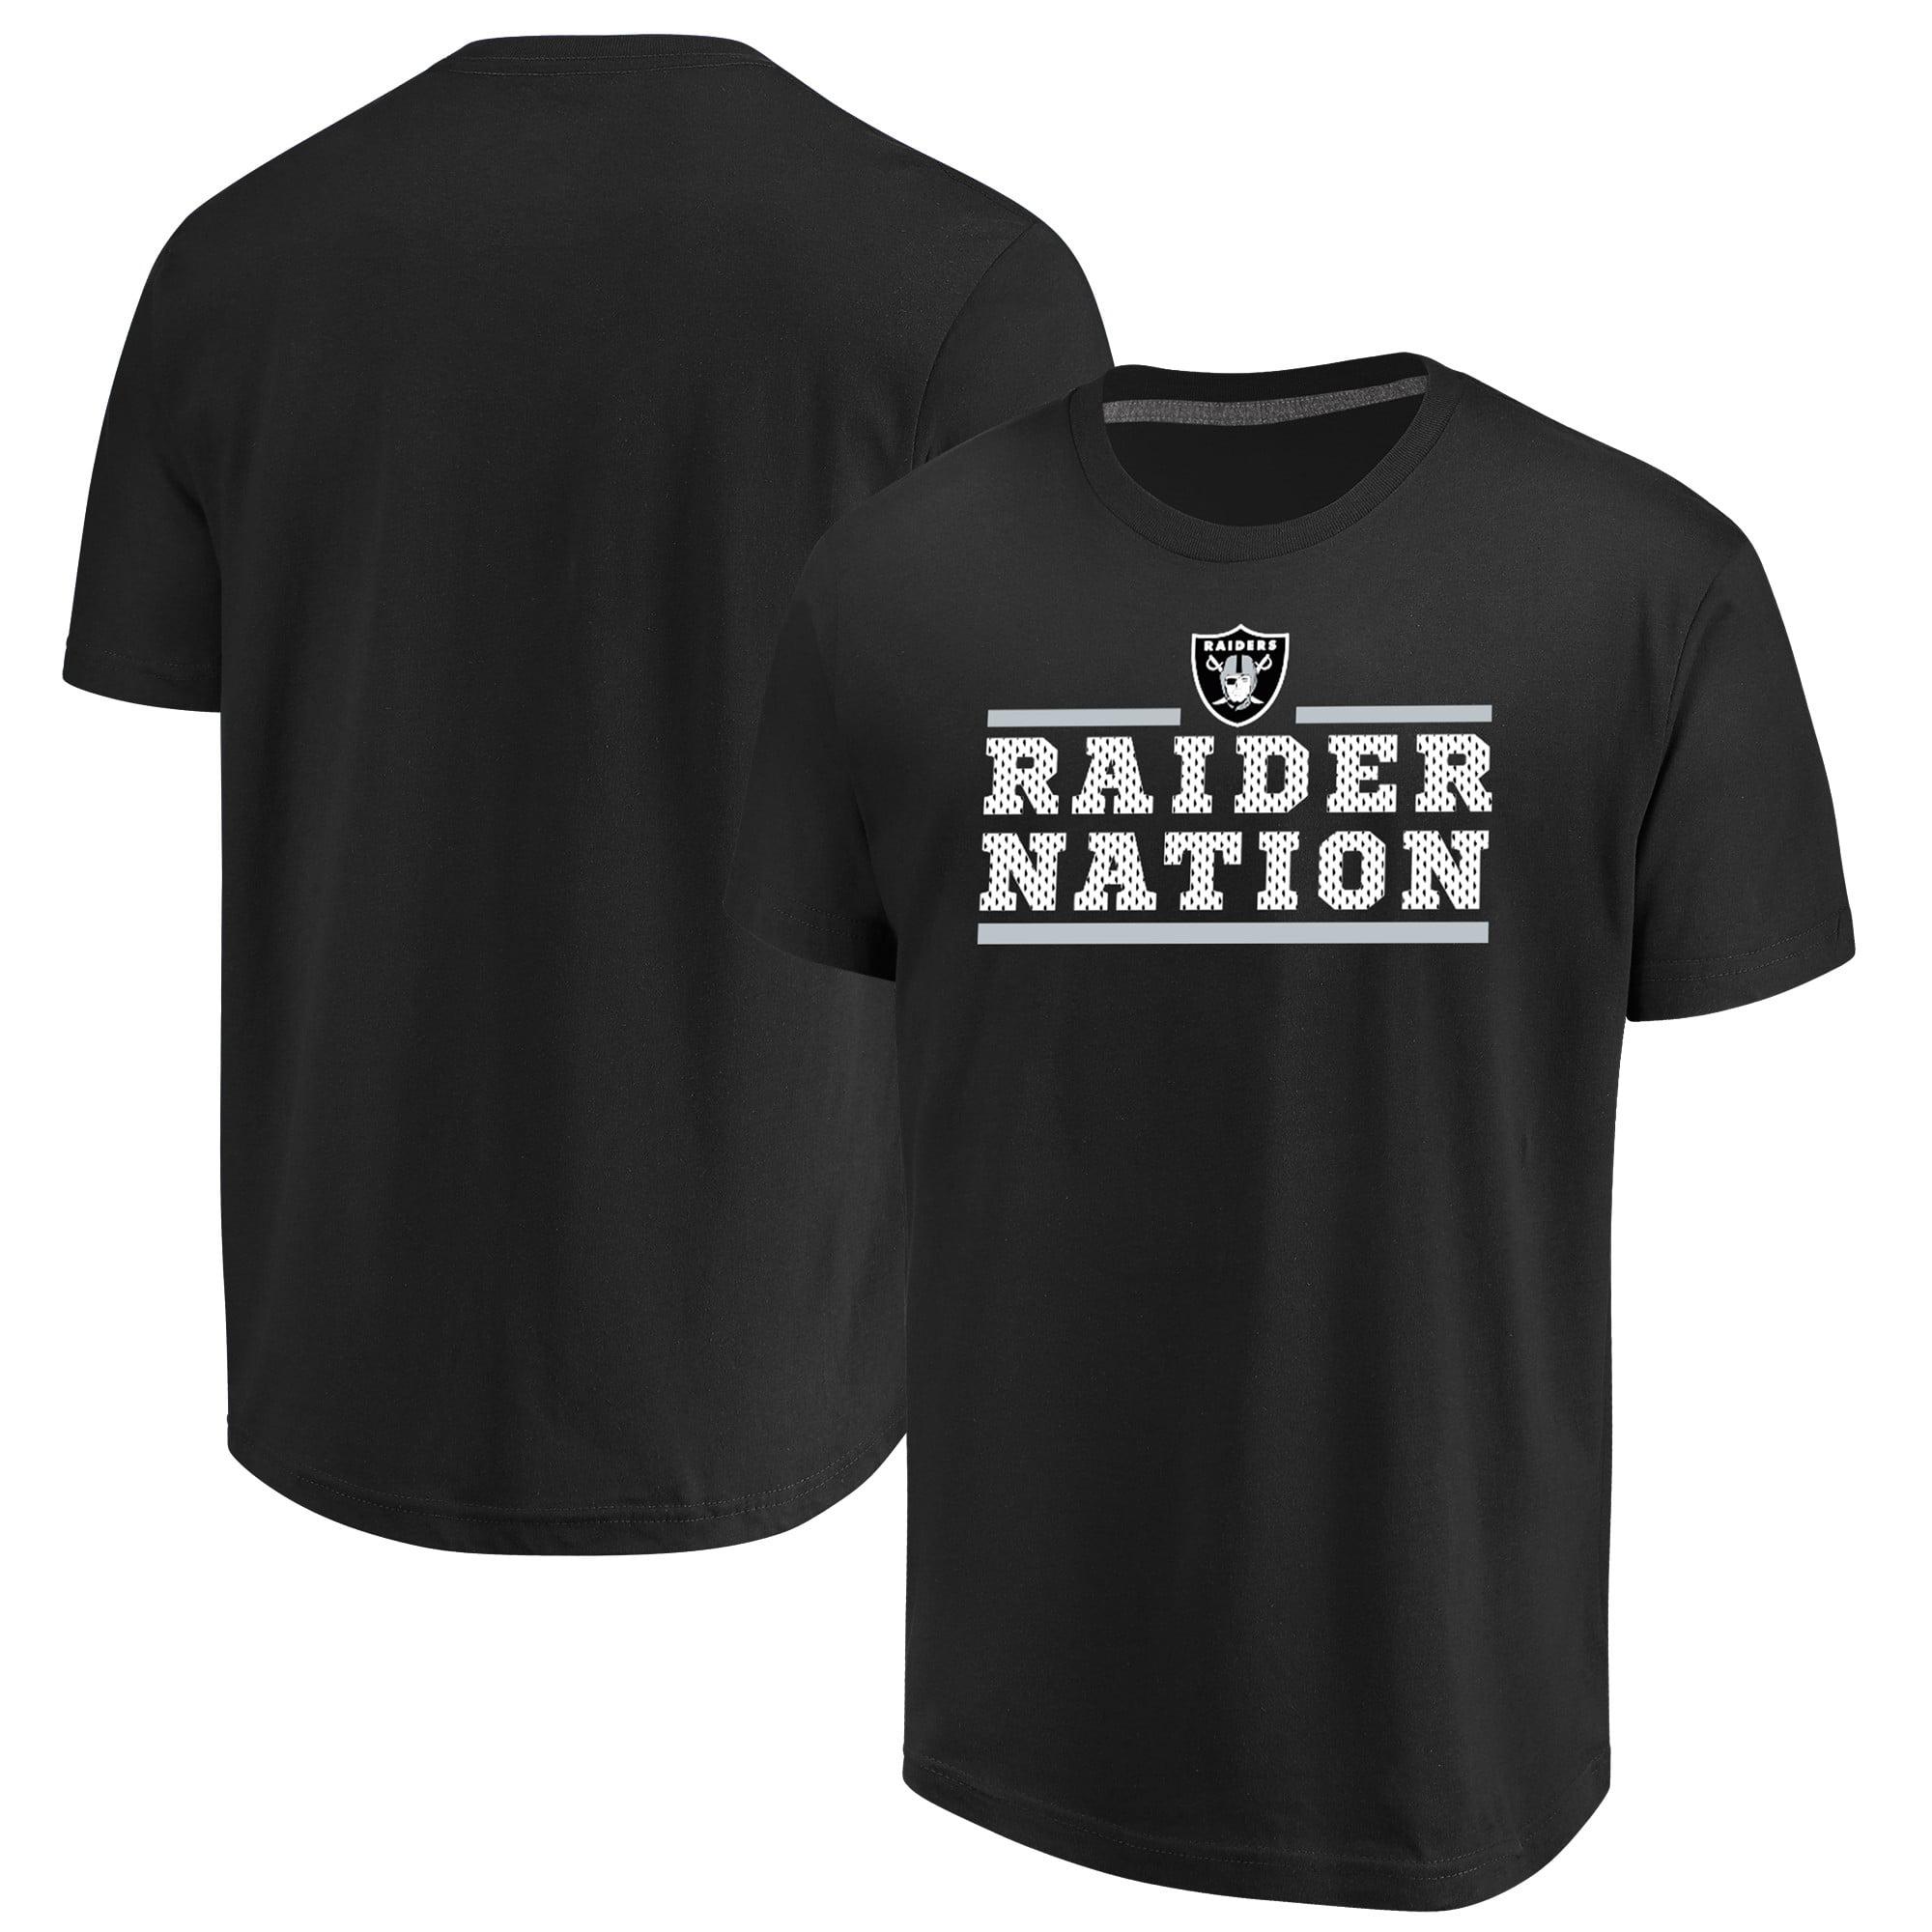 Oakland Raiders Majestic Safety Blitz T-Shirt - Black